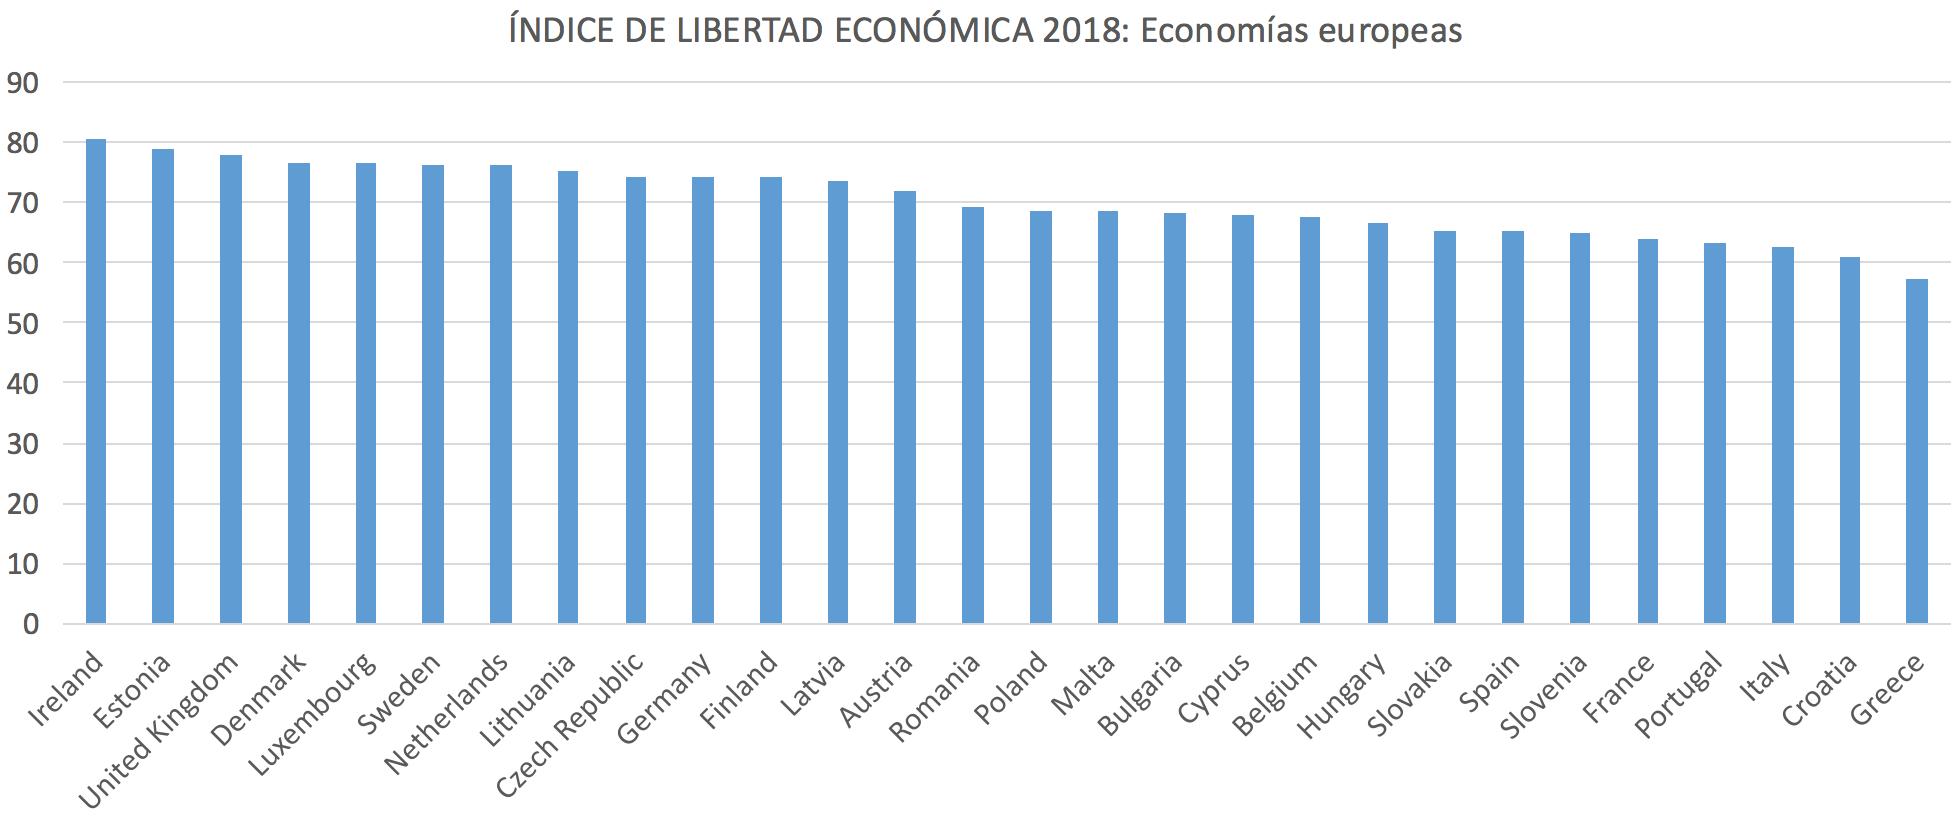 1-Ranking-Libertad-Economica-Union_Europ